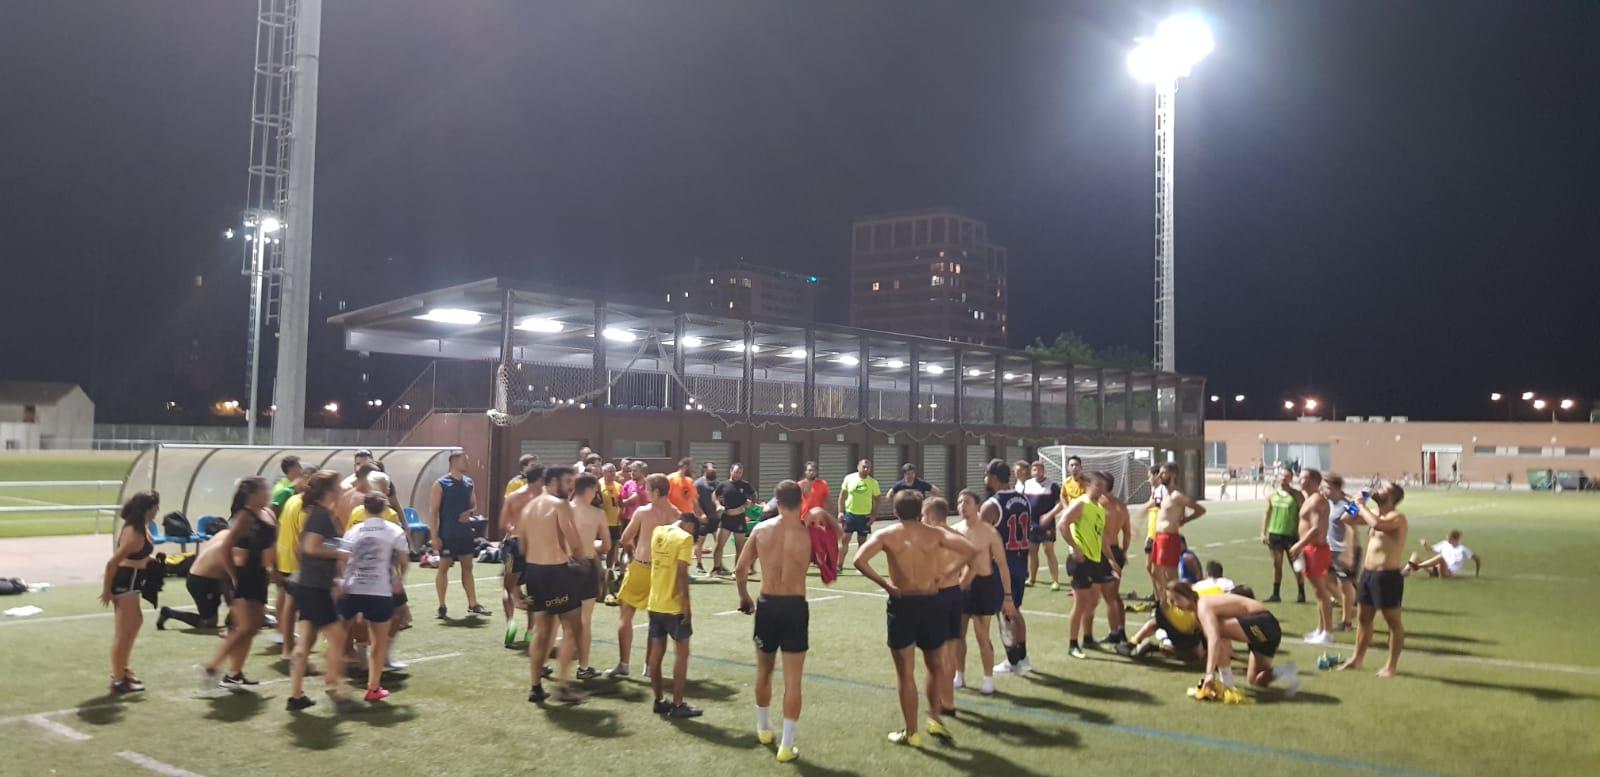 INICIO DE TEMPORADA 2018-19